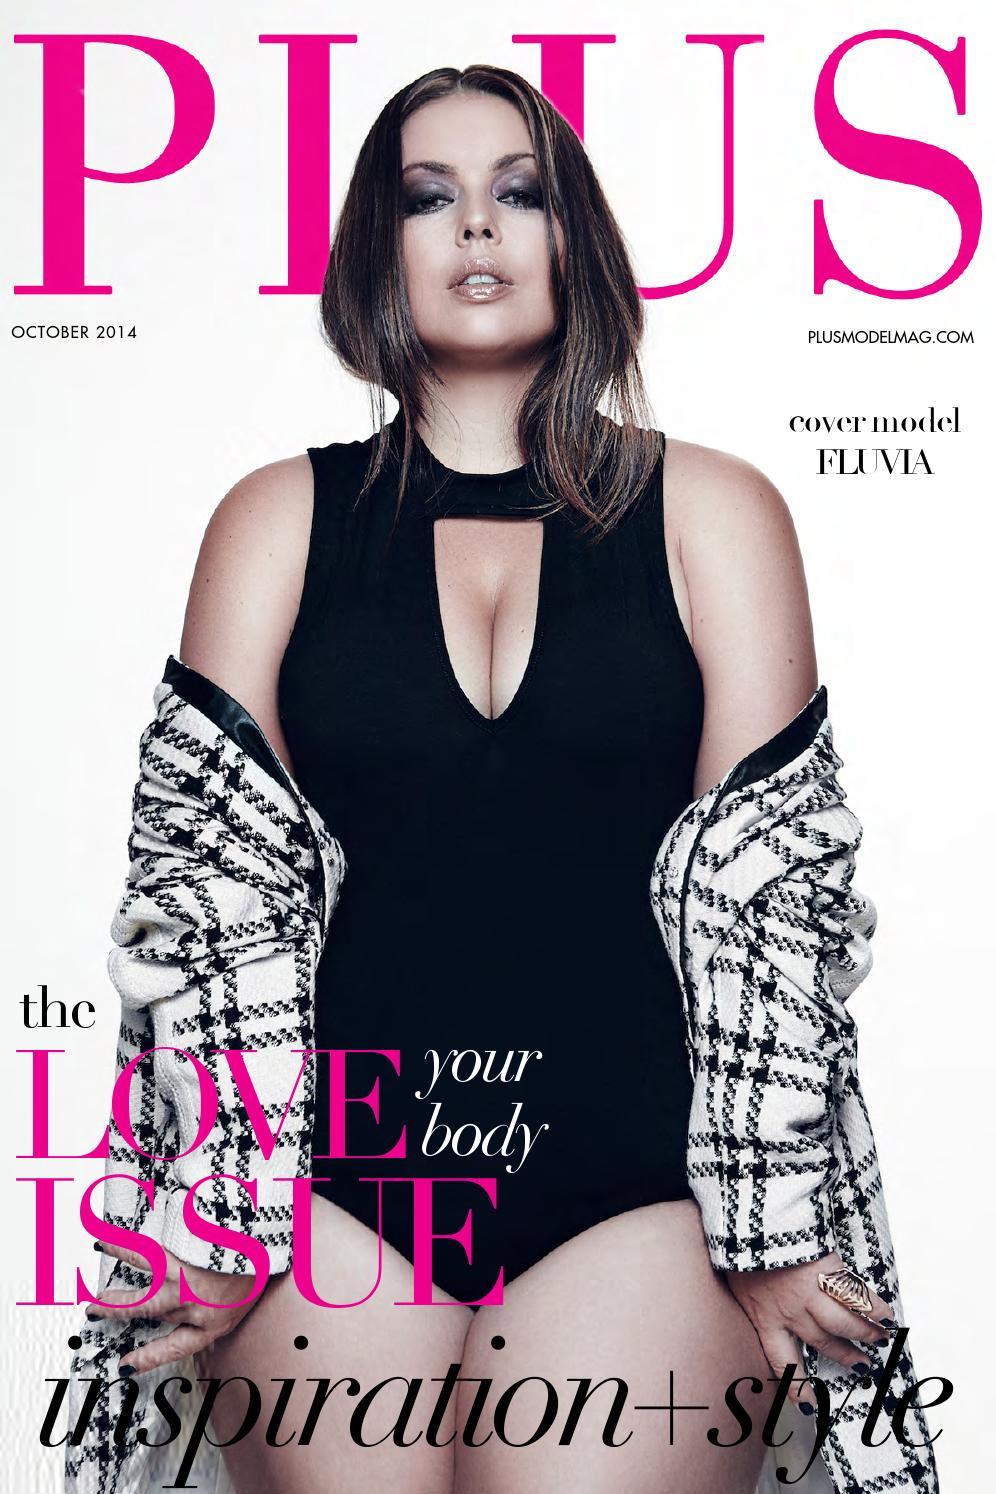 plus model magazine october 2014 issue by plus model magazine issuu. Black Bedroom Furniture Sets. Home Design Ideas